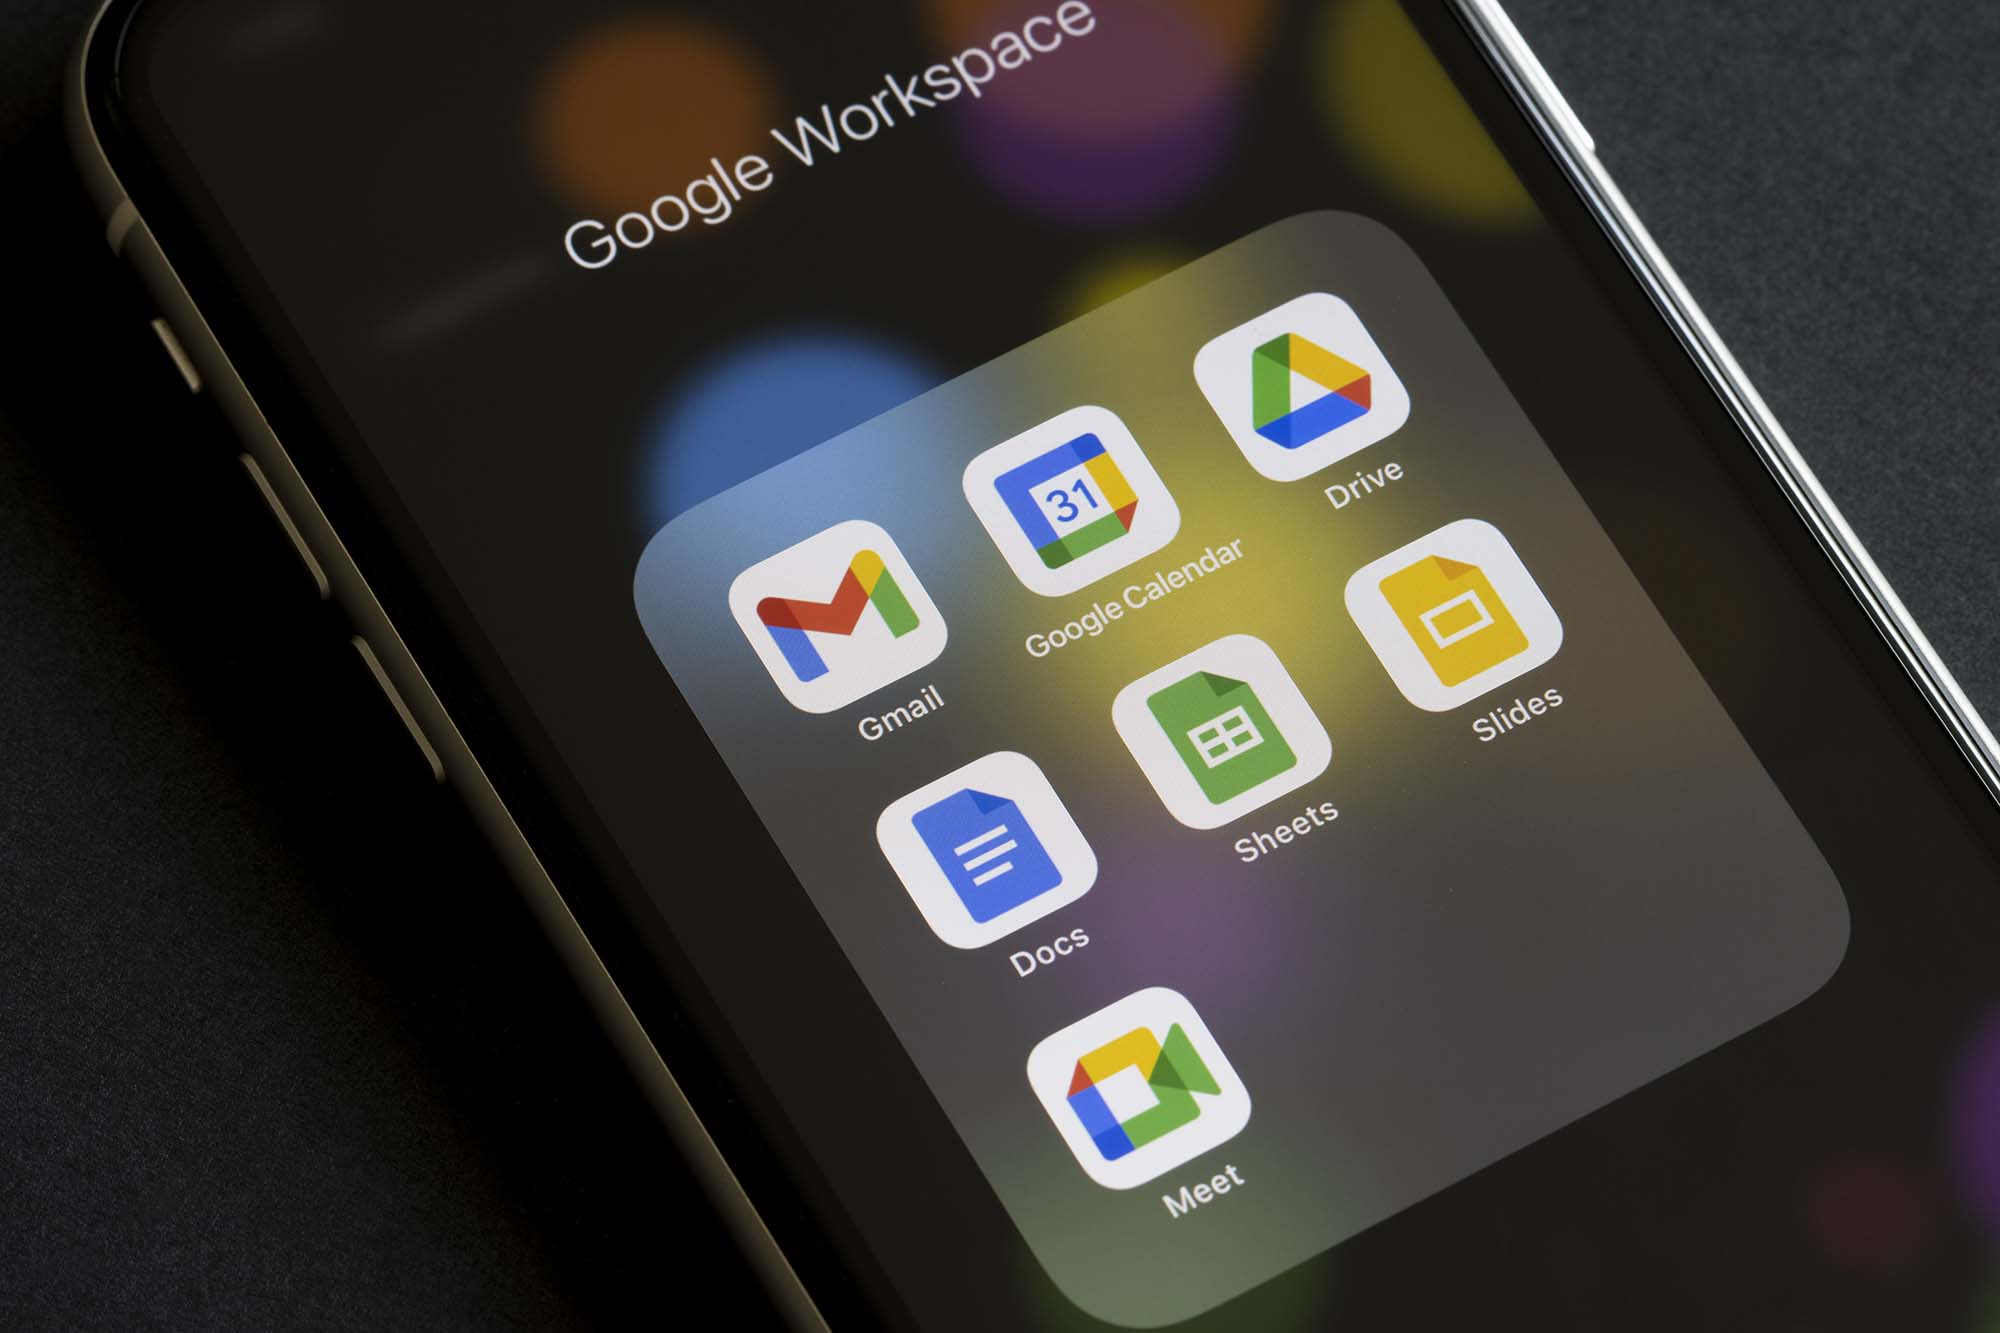 Google app icons on screen